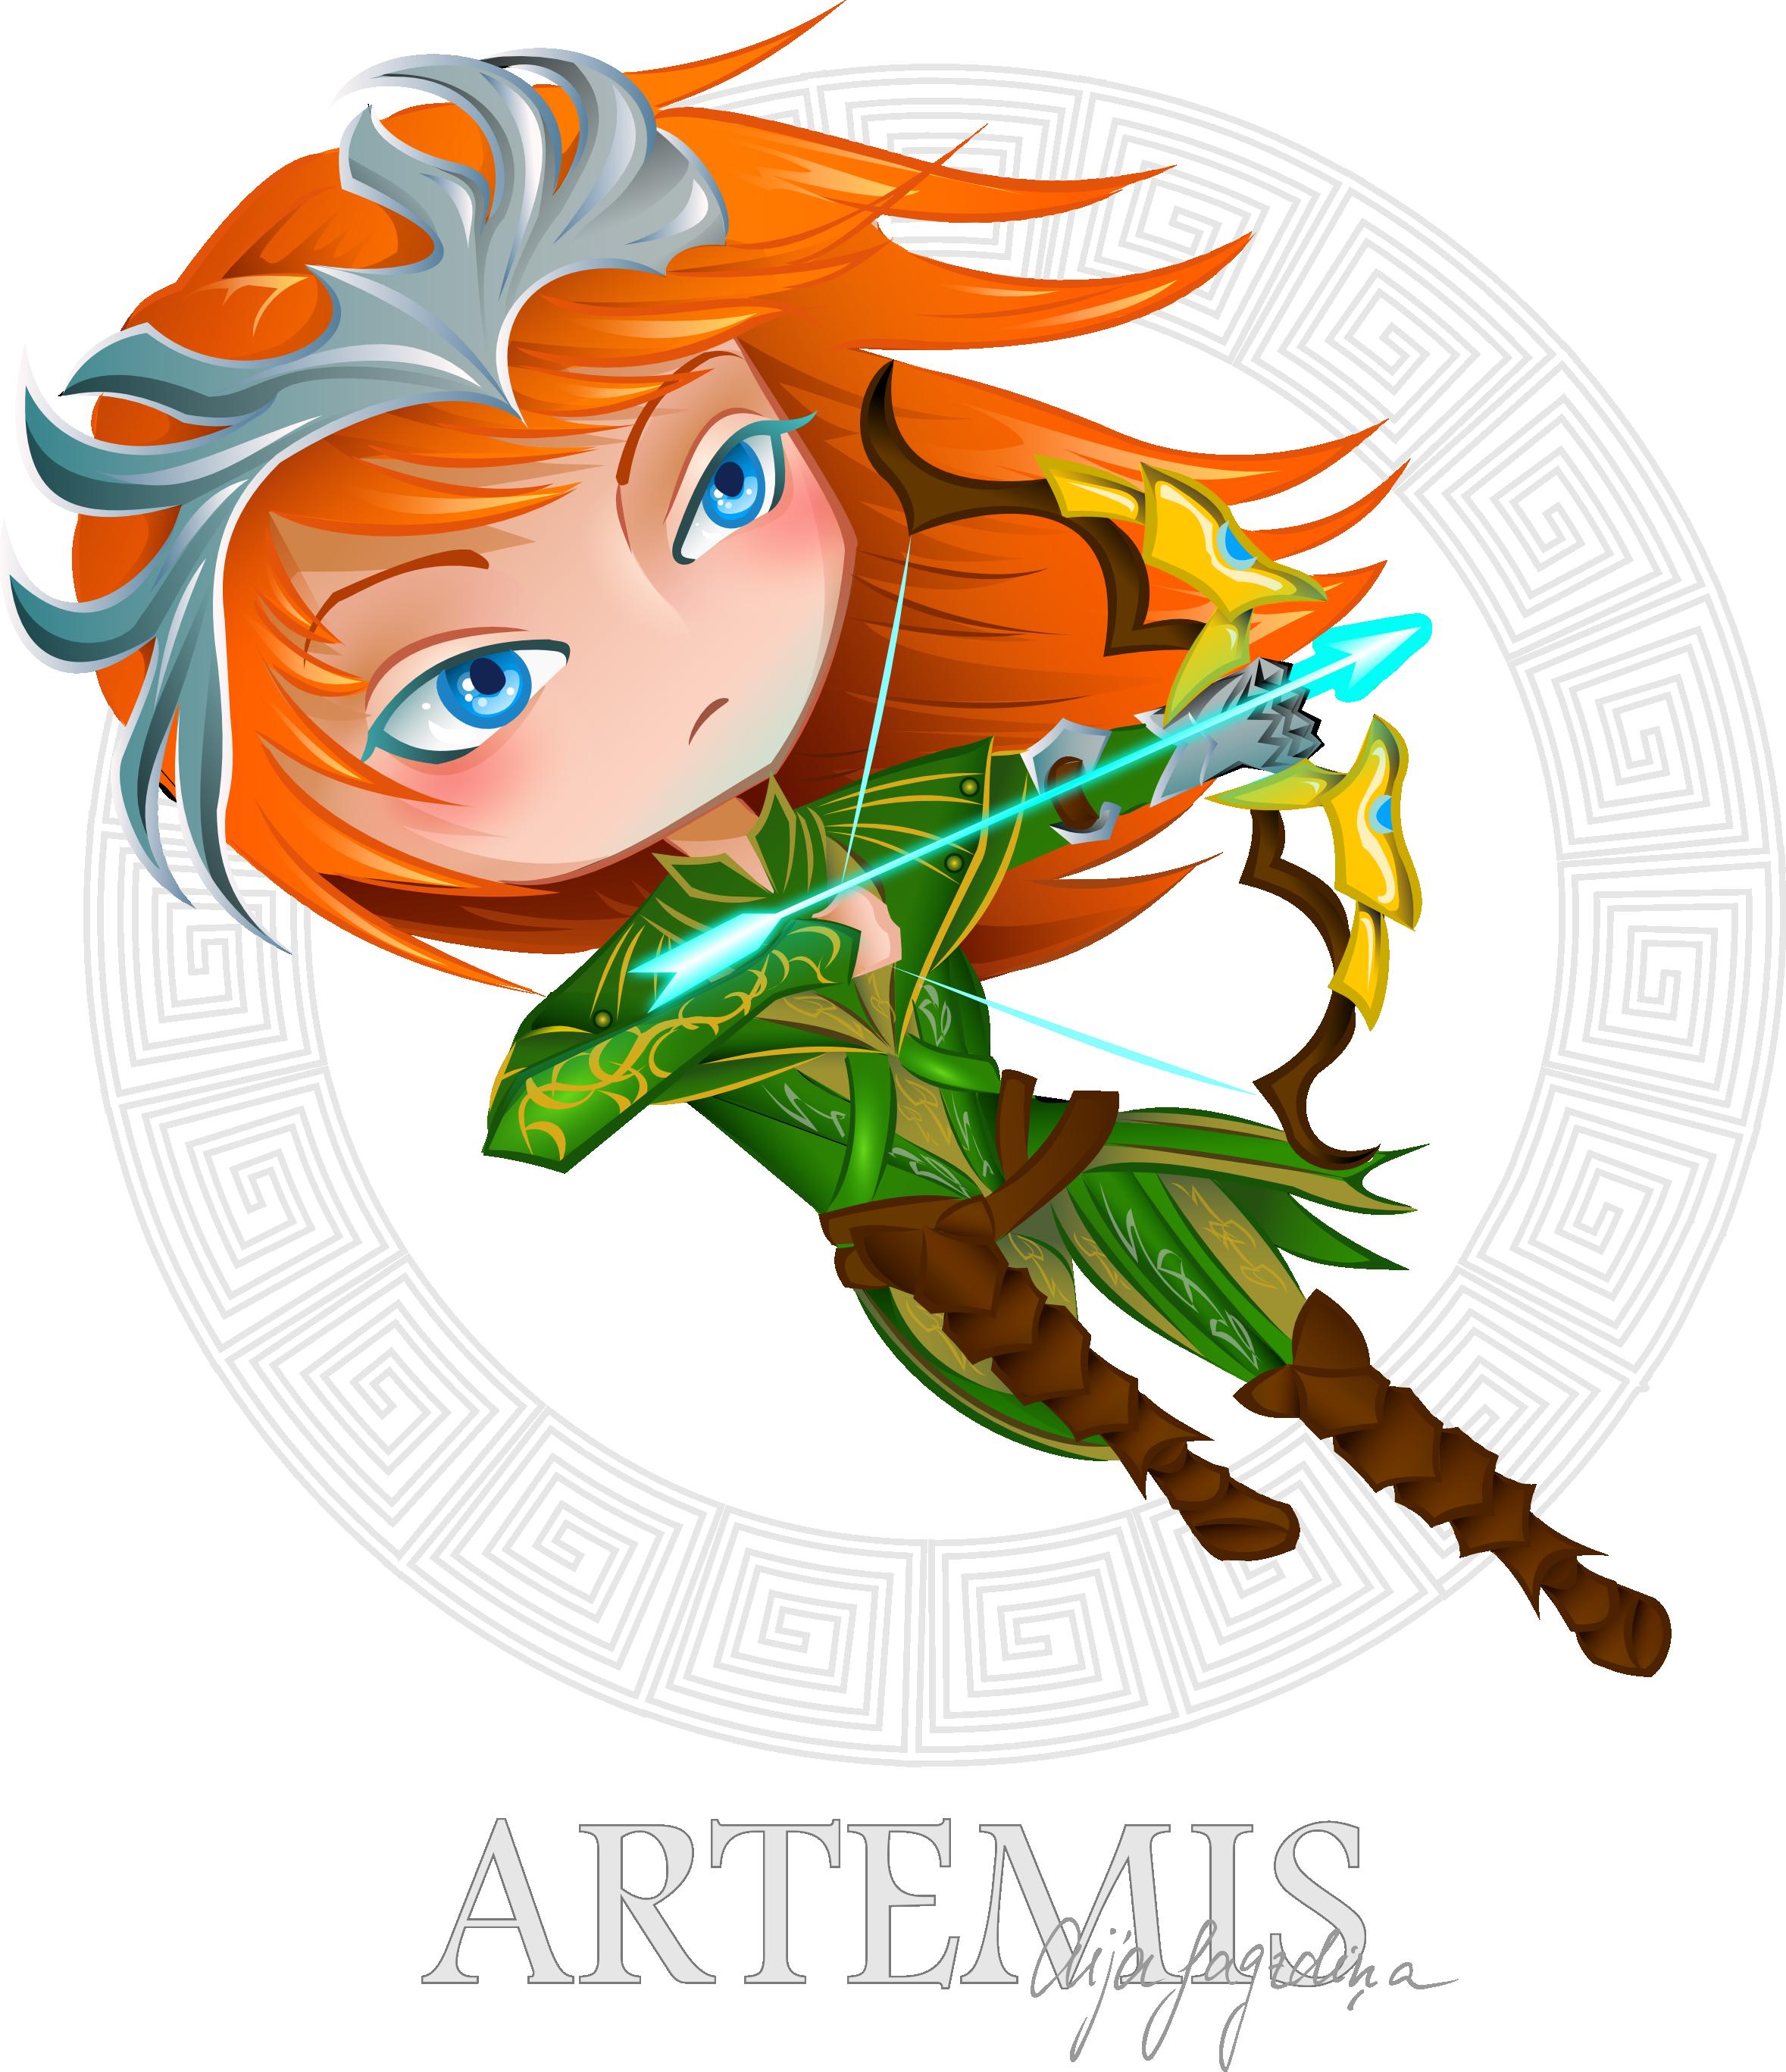 Artemis - Smite Fanart By Chirkucis.devi-Artemis - Smite fanart by chirkucis.deviantart clipartlook.com on @DeviantArt-20